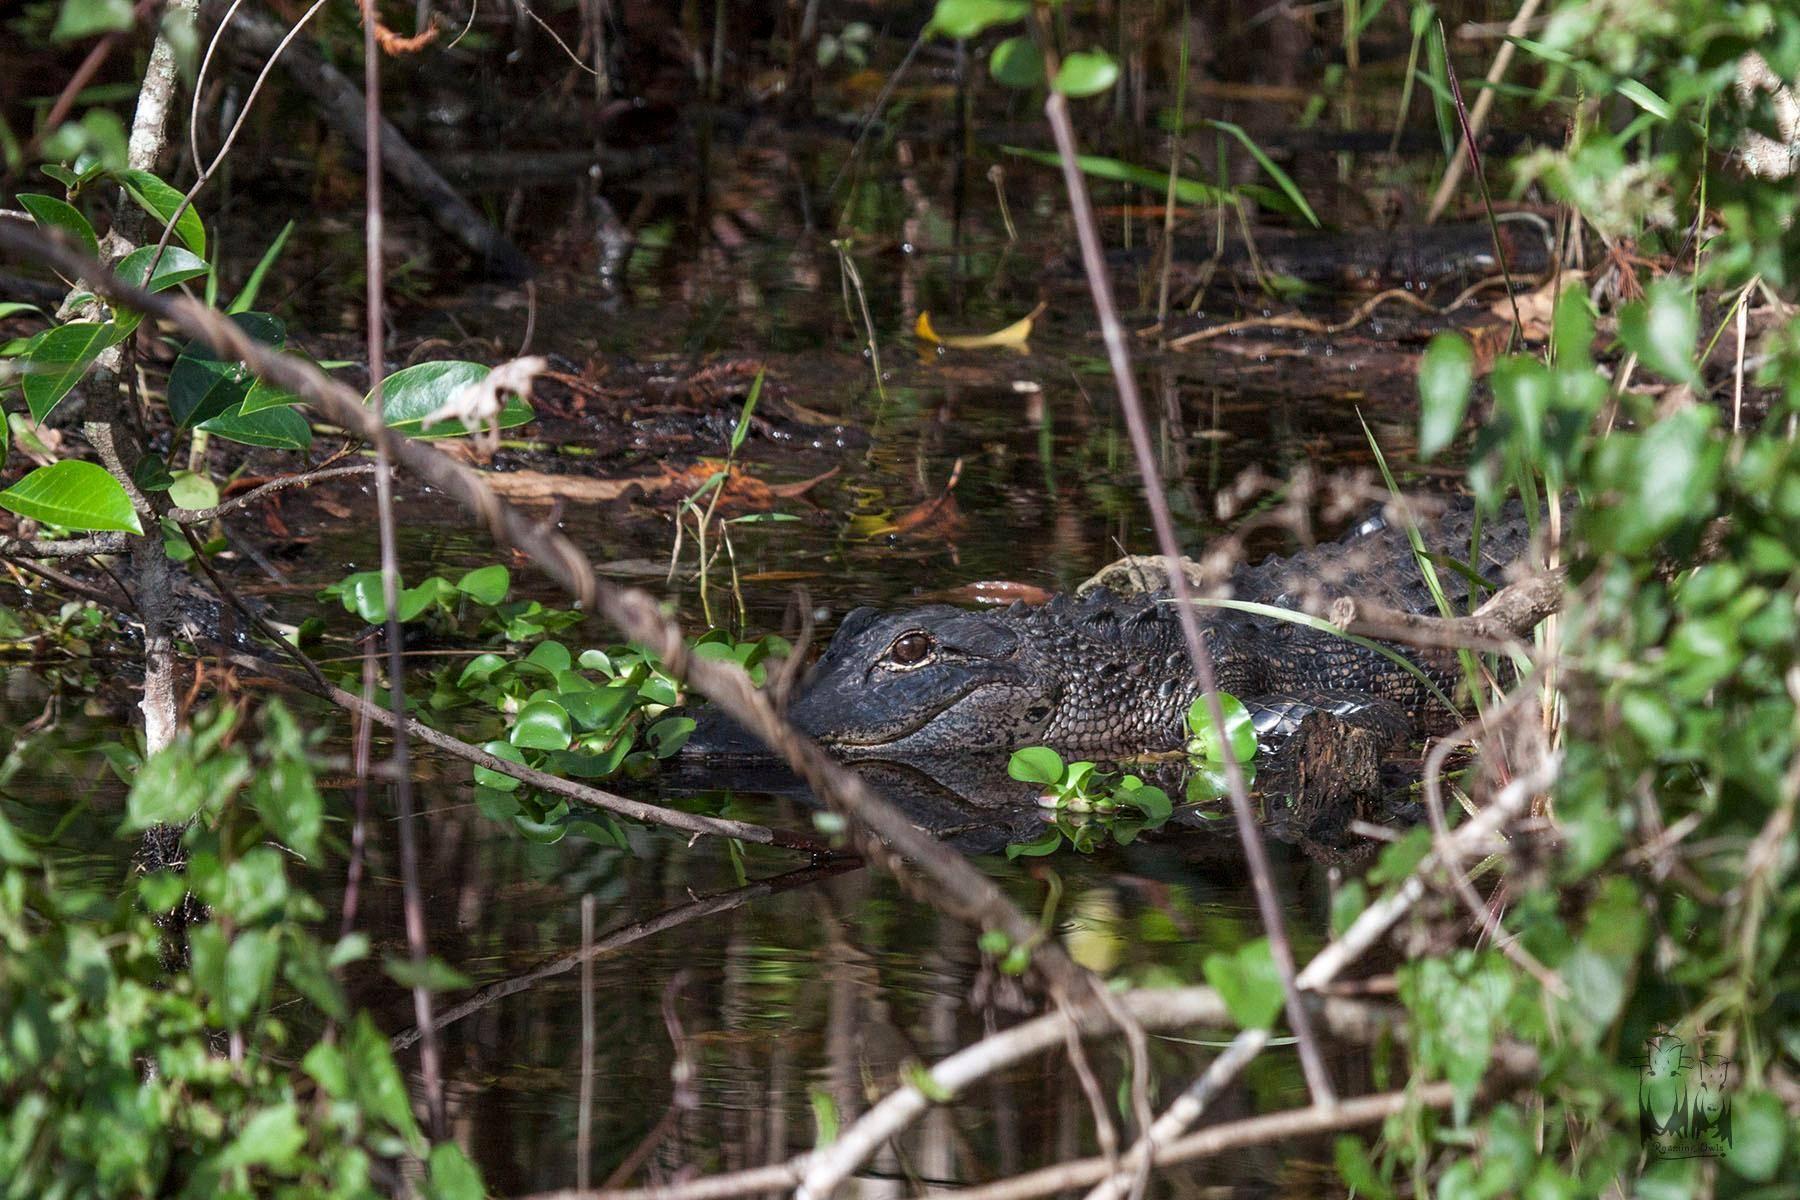 Everglades national park alligator,Florida alligator,Alligator Walk,clyde butcher swamp walk